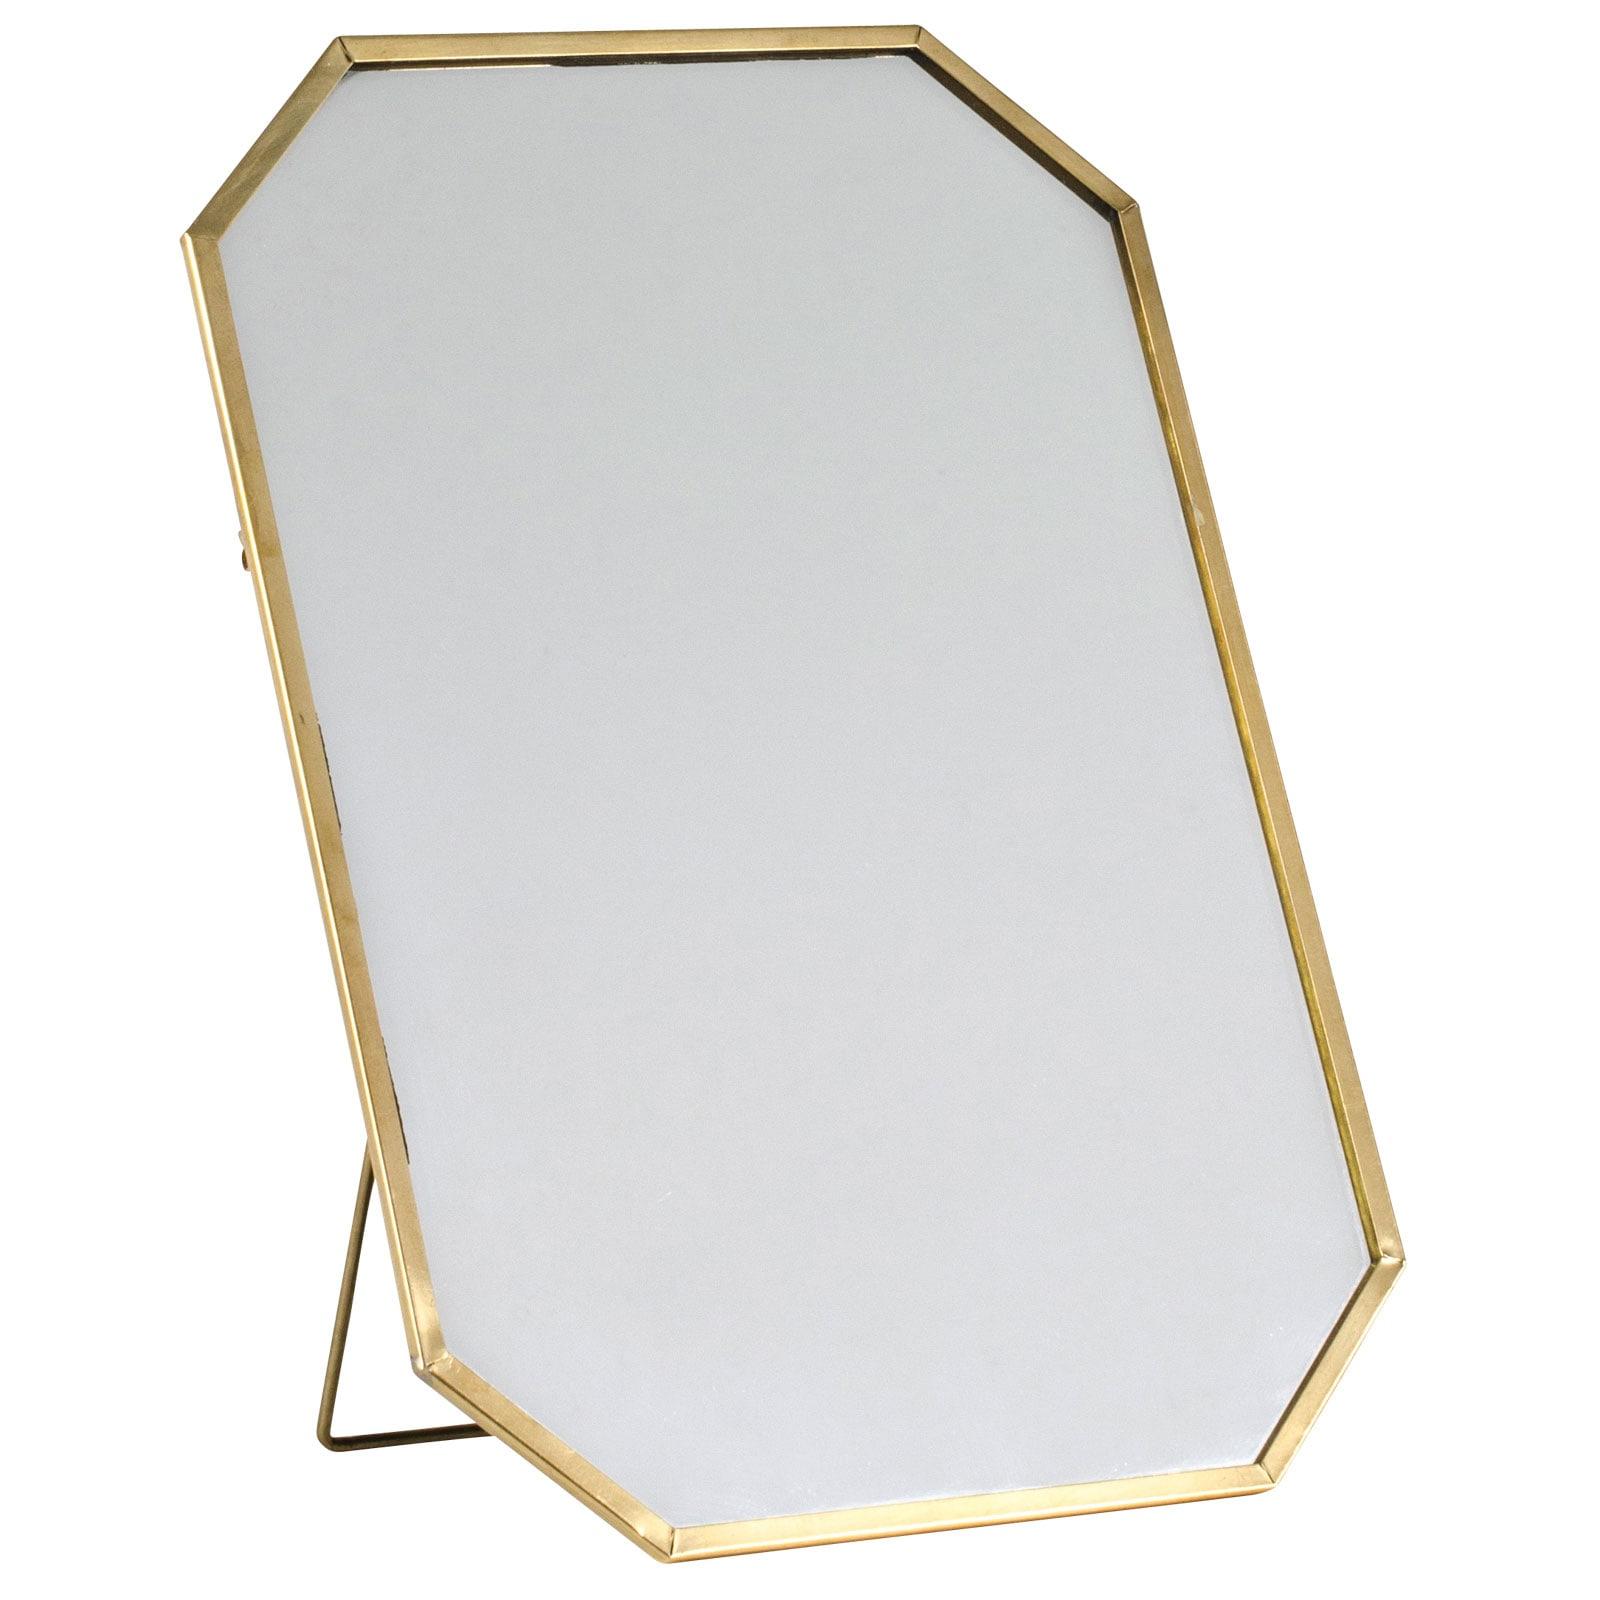 lagerhaus spegel